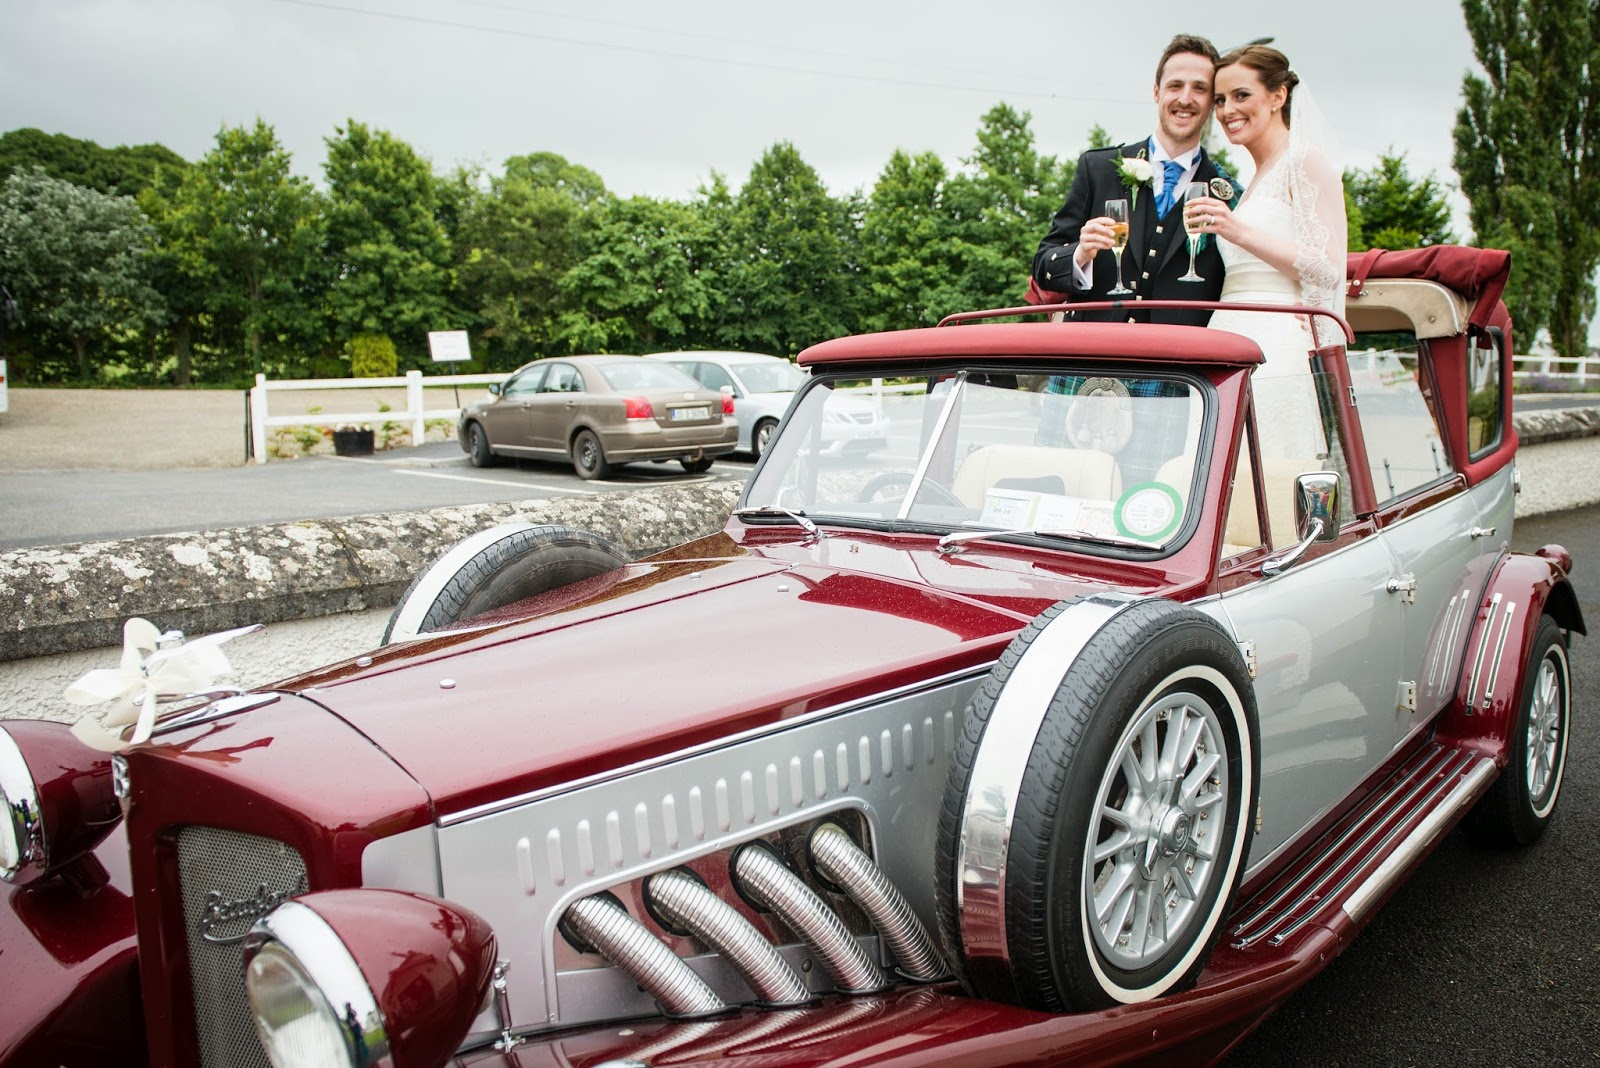 Amazing Birmingham Wedding Cars Ideas - Classic Cars Ideas - boiq.info